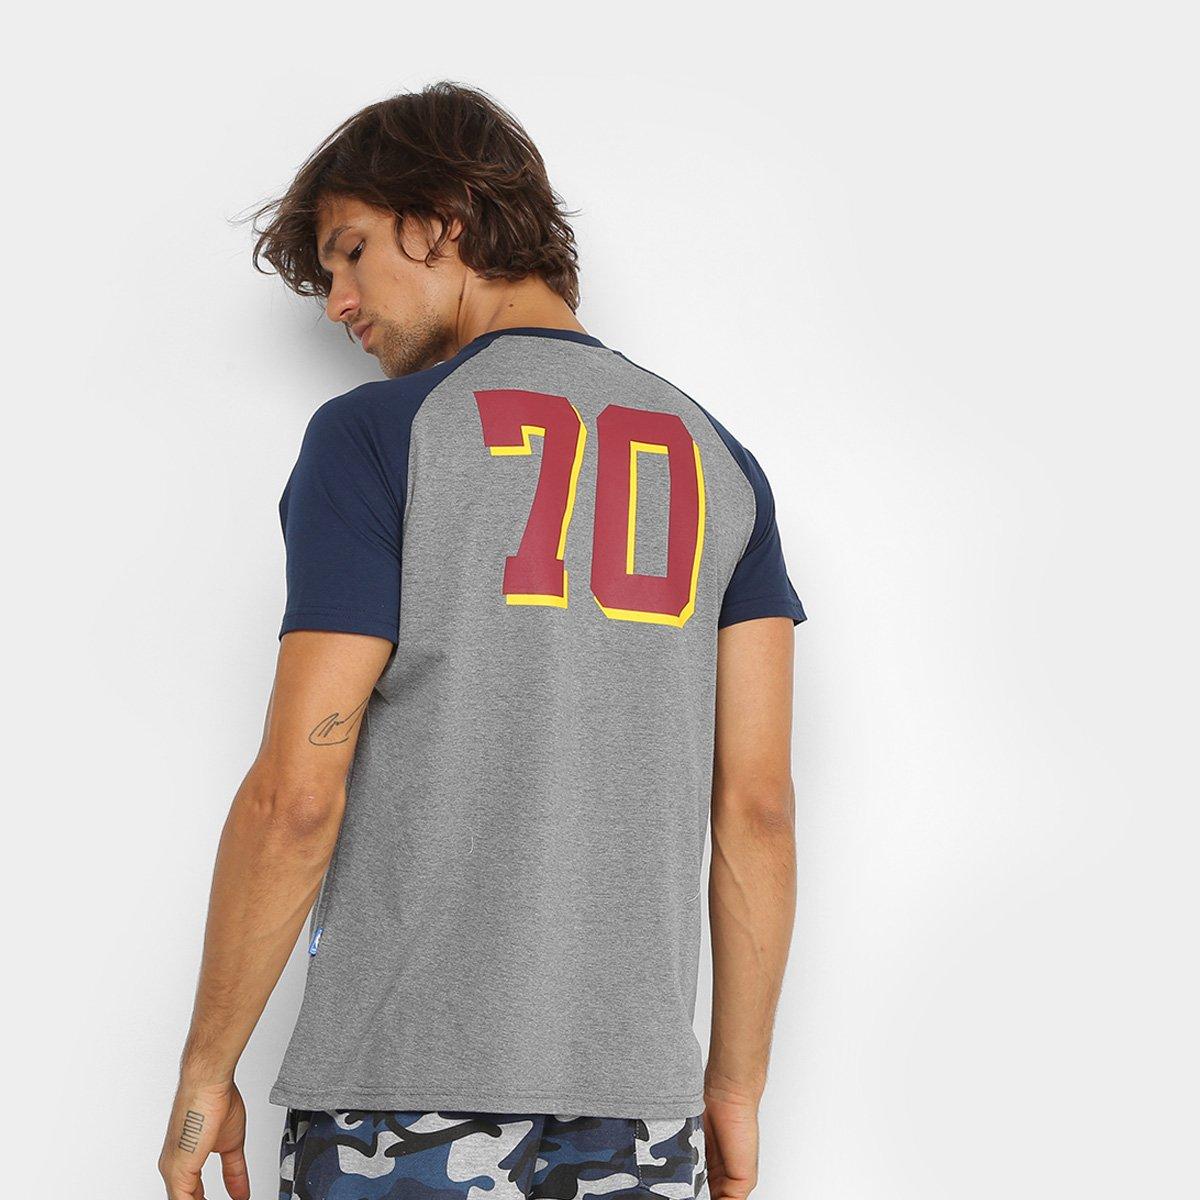 Camiseta NBA Cleveland Cavaliers 17 Masculina - Cinza e Marinho ... d4143033ae956